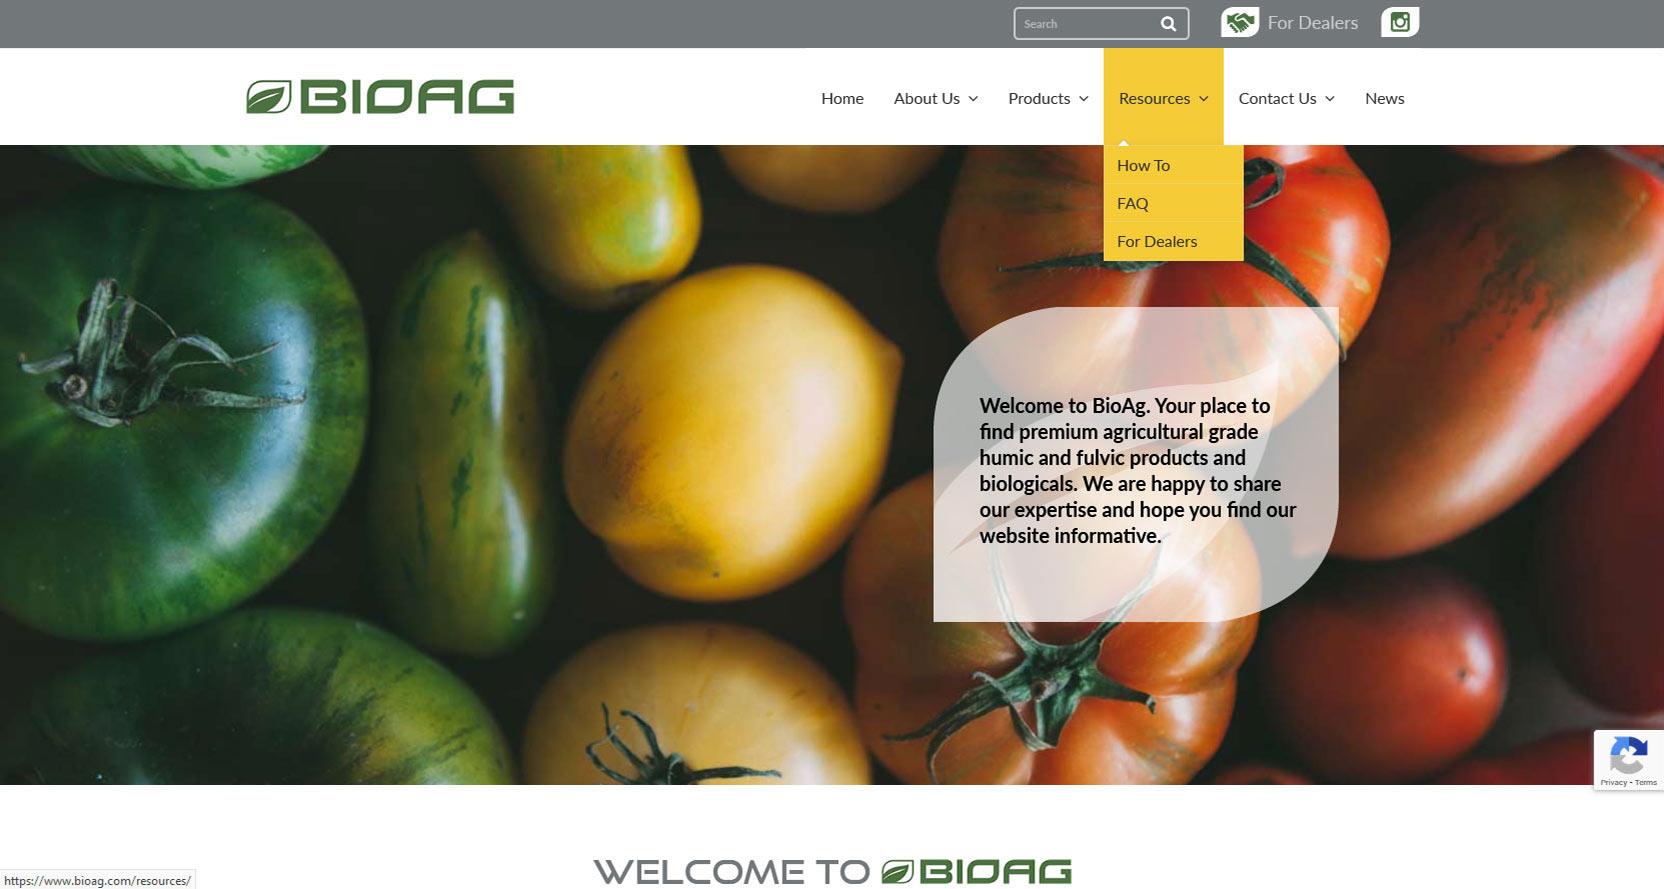 Rogue EasyWeb Web Design Case Study: BioAg